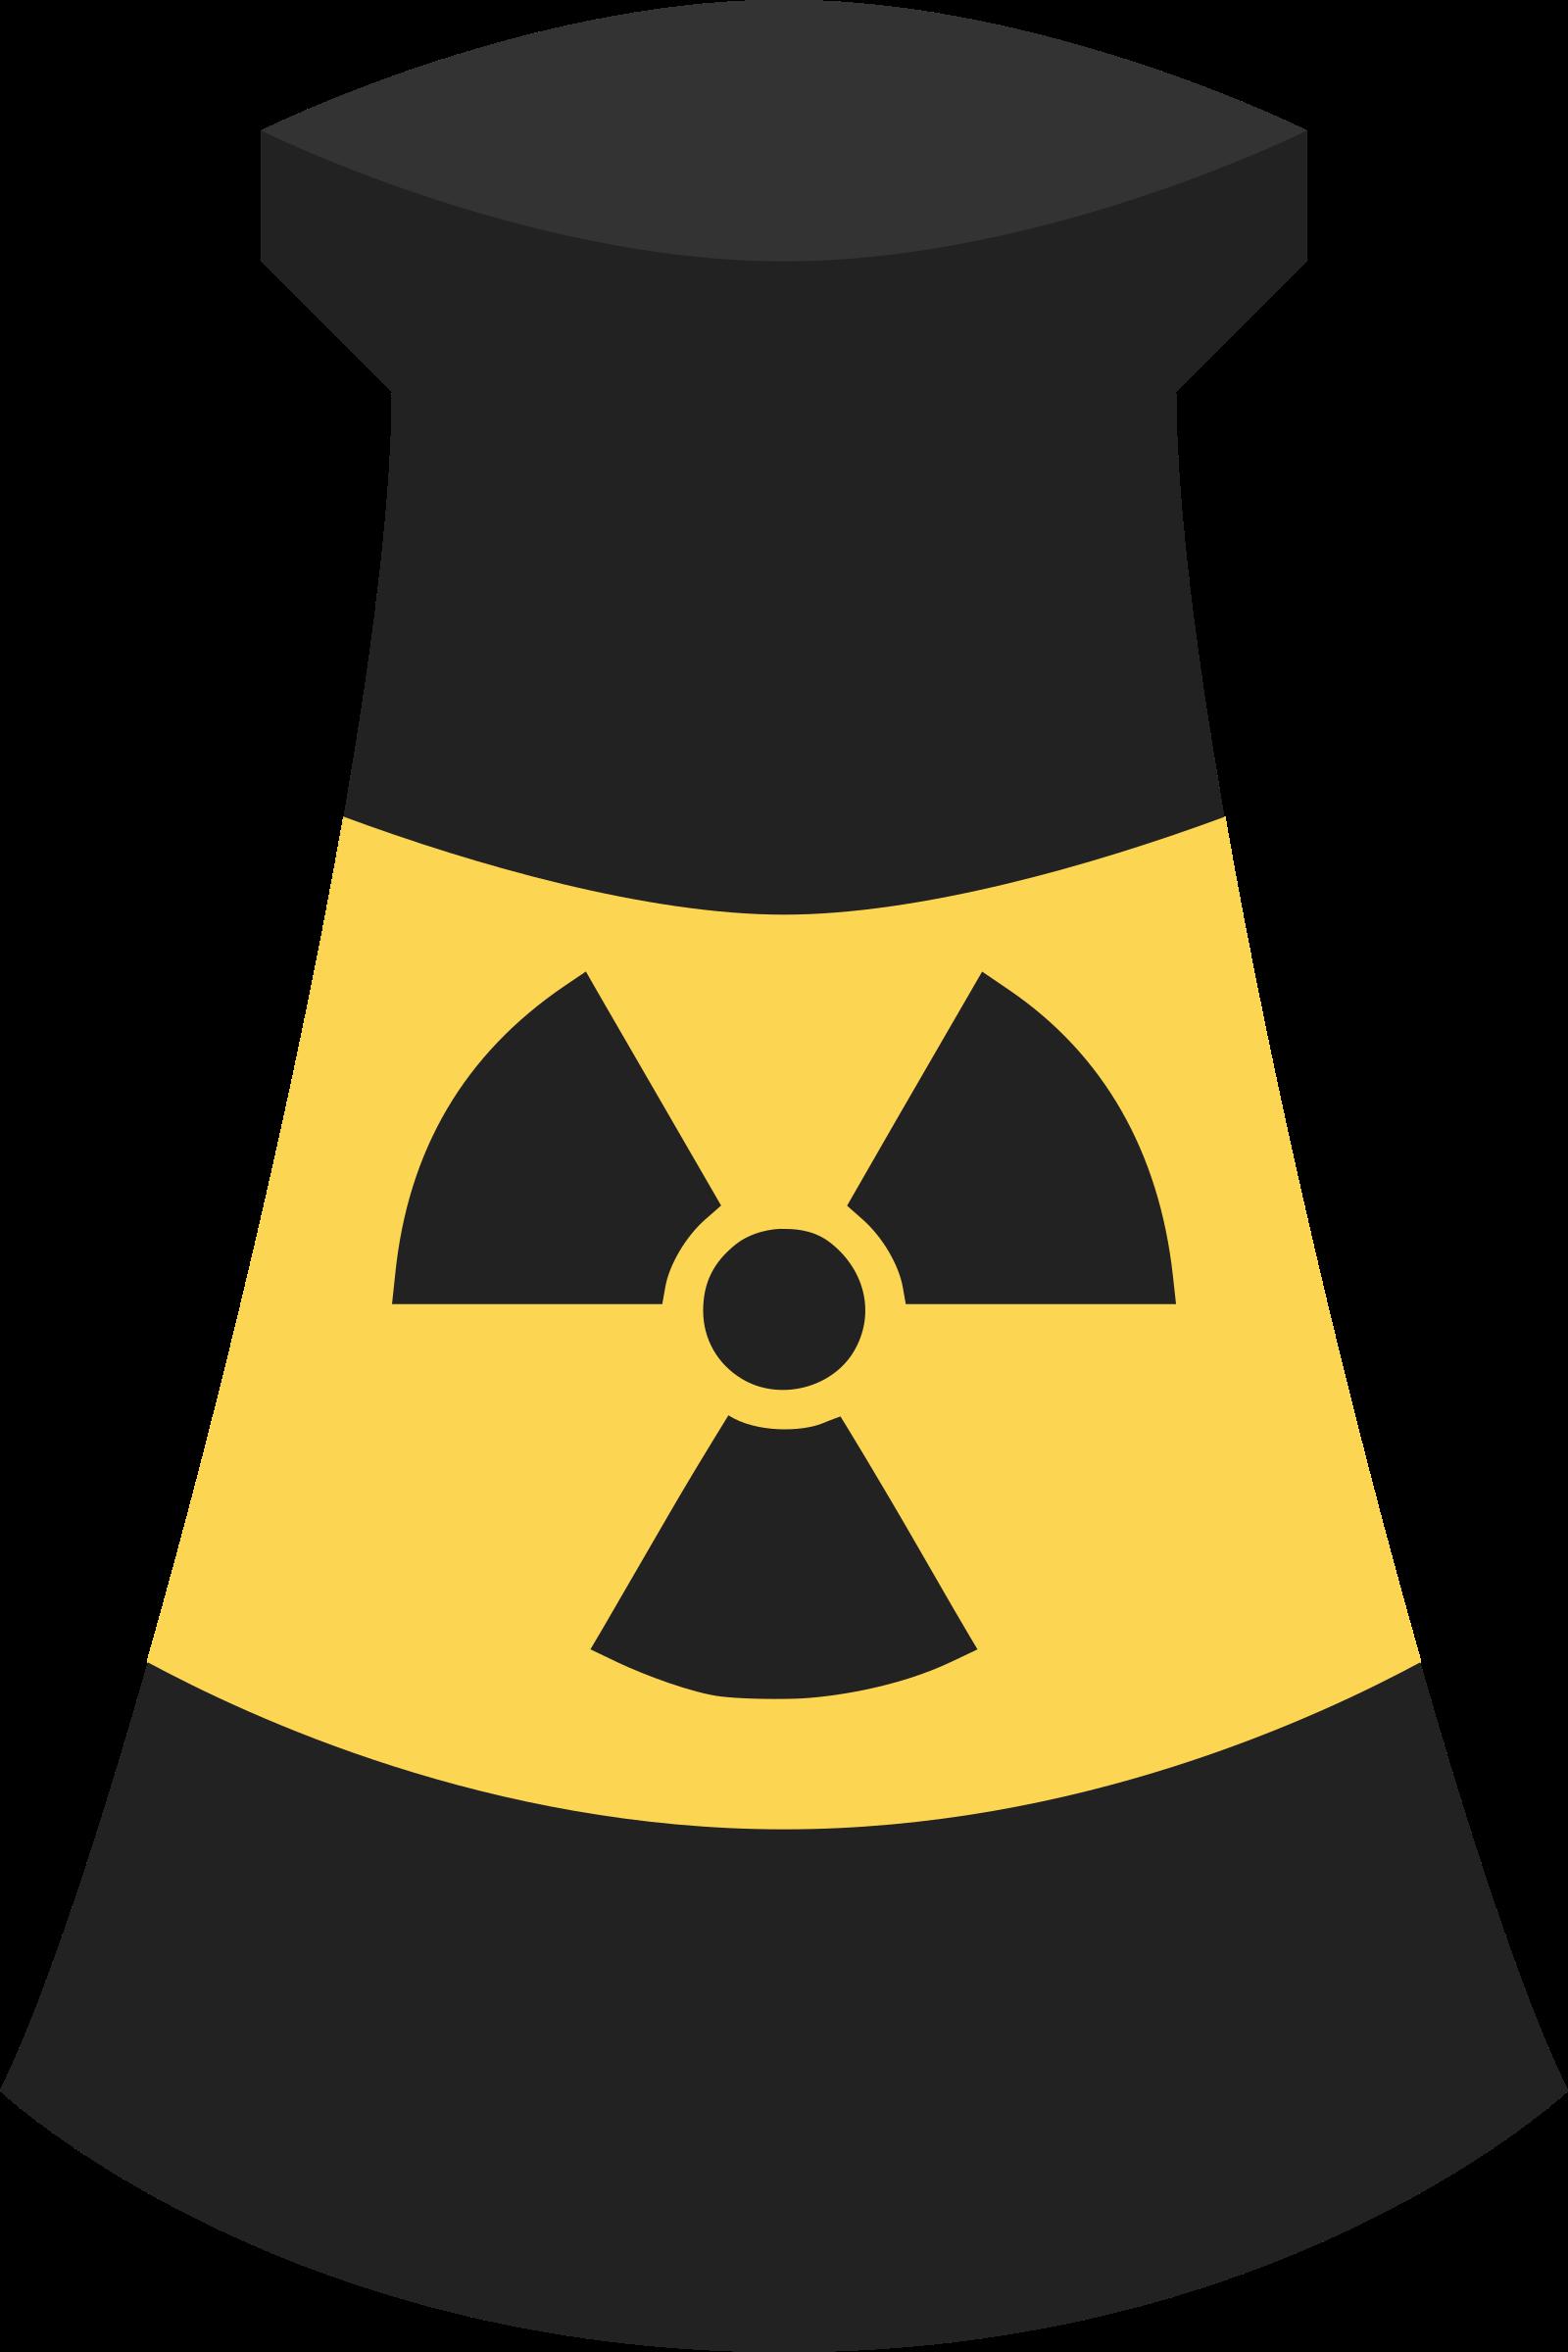 Atomic plant symbol big. Atom clipart energy